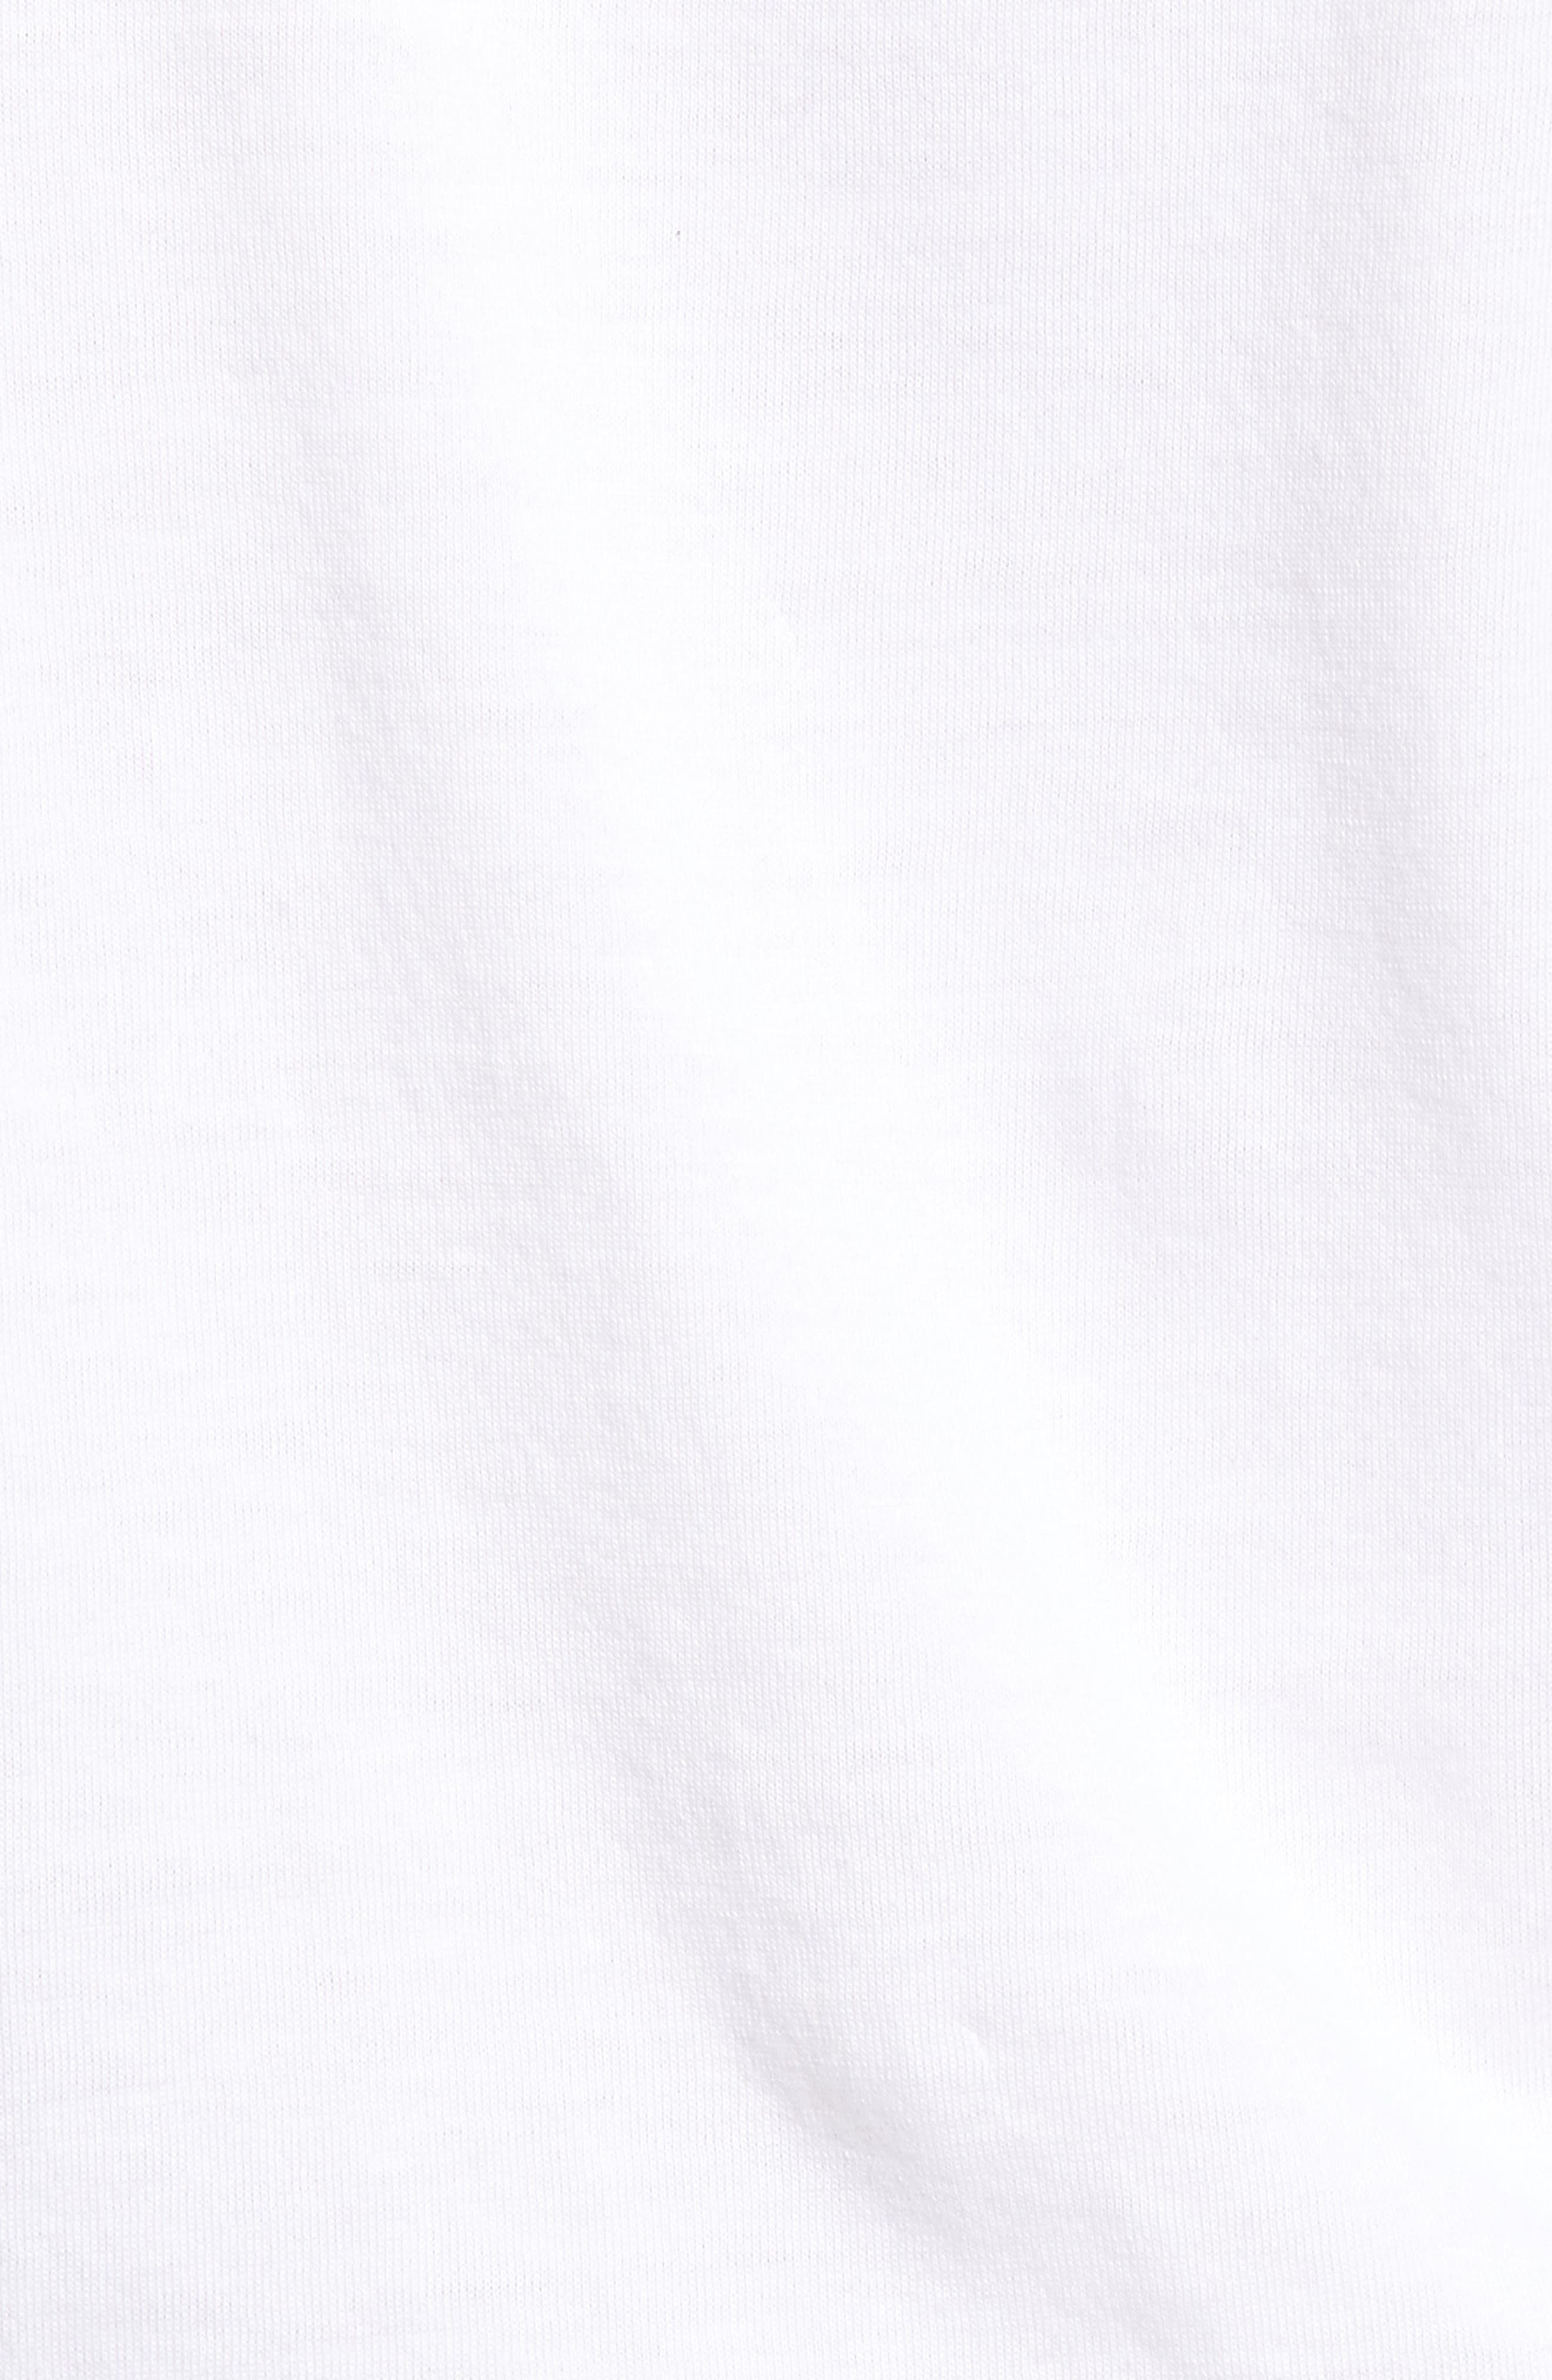 Short Sleeve Cotton Tee,                             Alternate thumbnail 55, color,